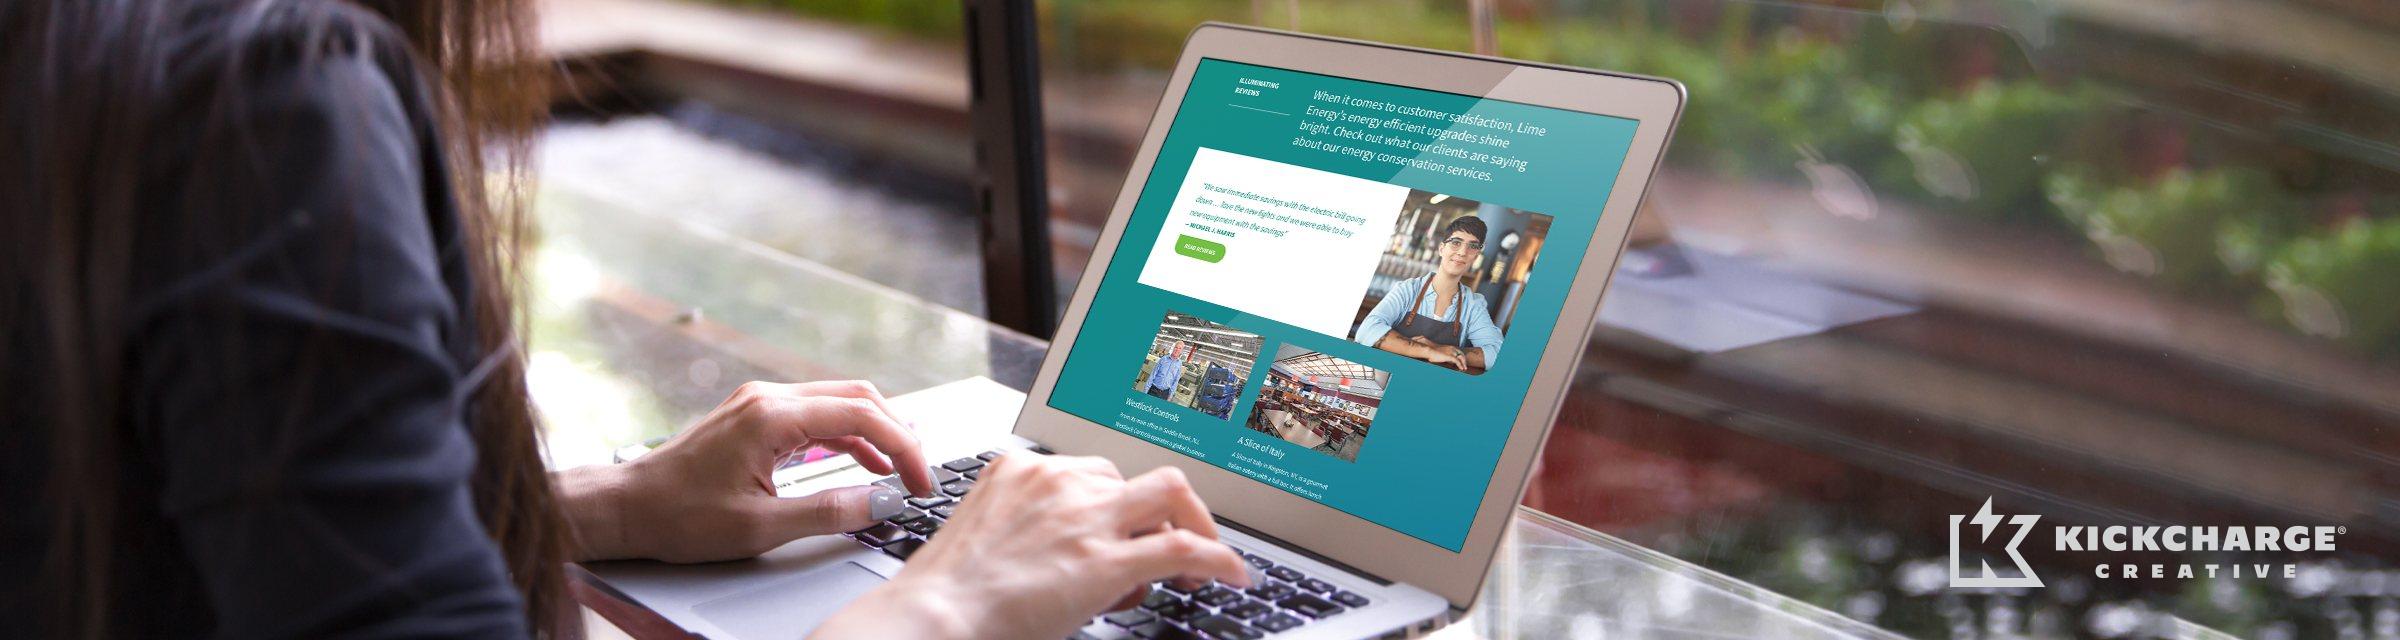 KickCharge Creative Blog | KickCharge Creative | kickcharge com